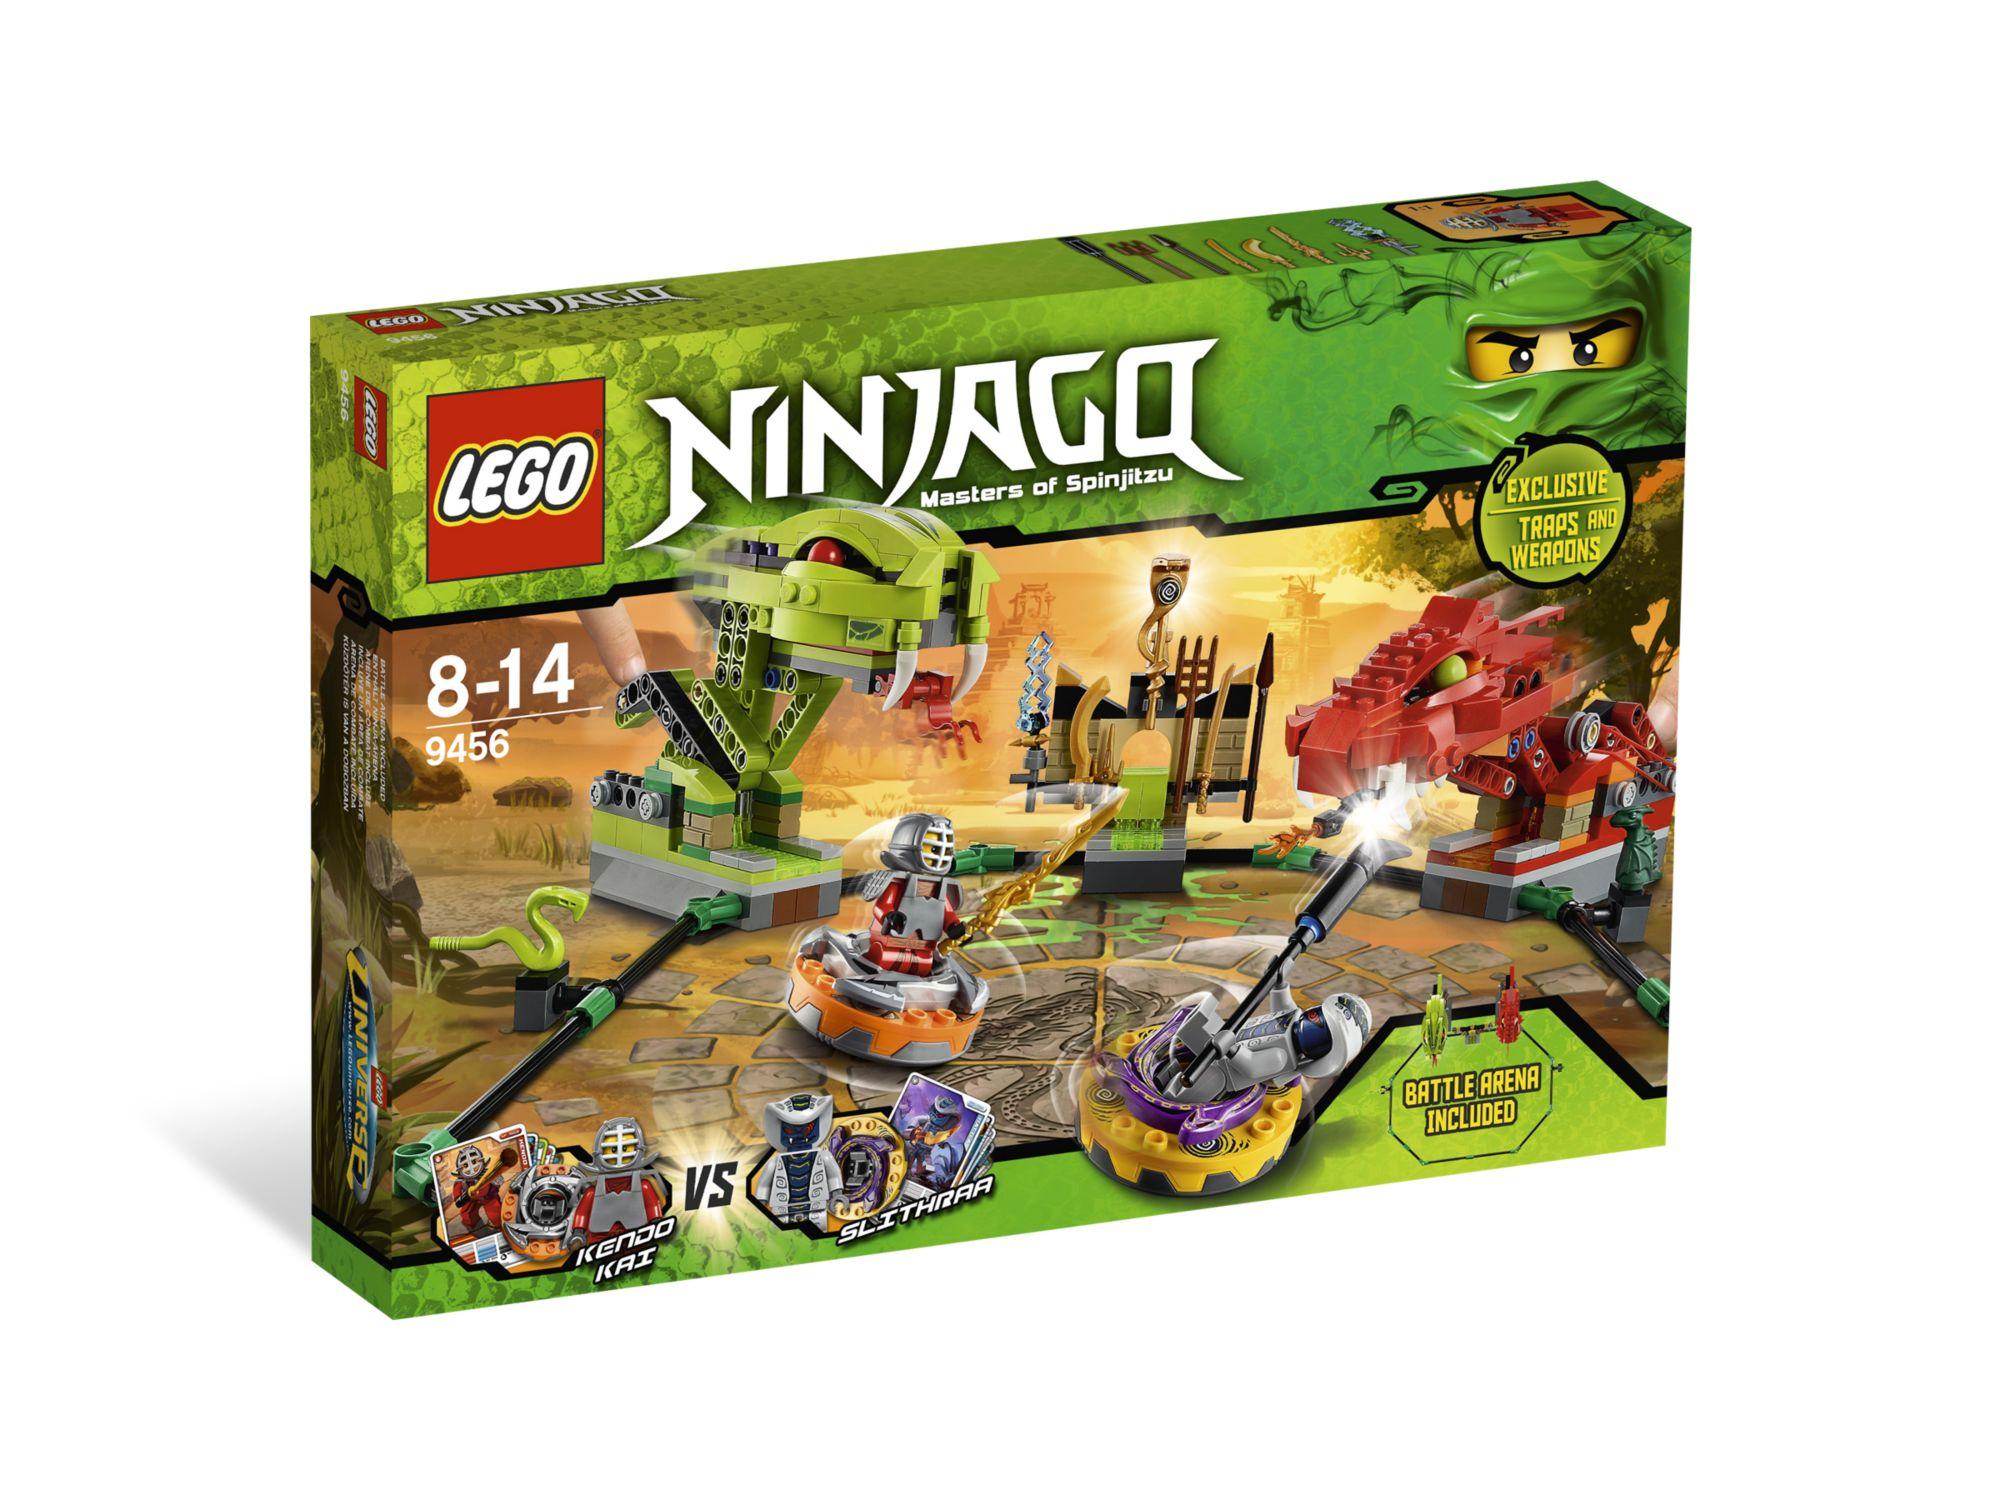 spinner battle arena - Jeux De Lego Ninjago Spinjitzu